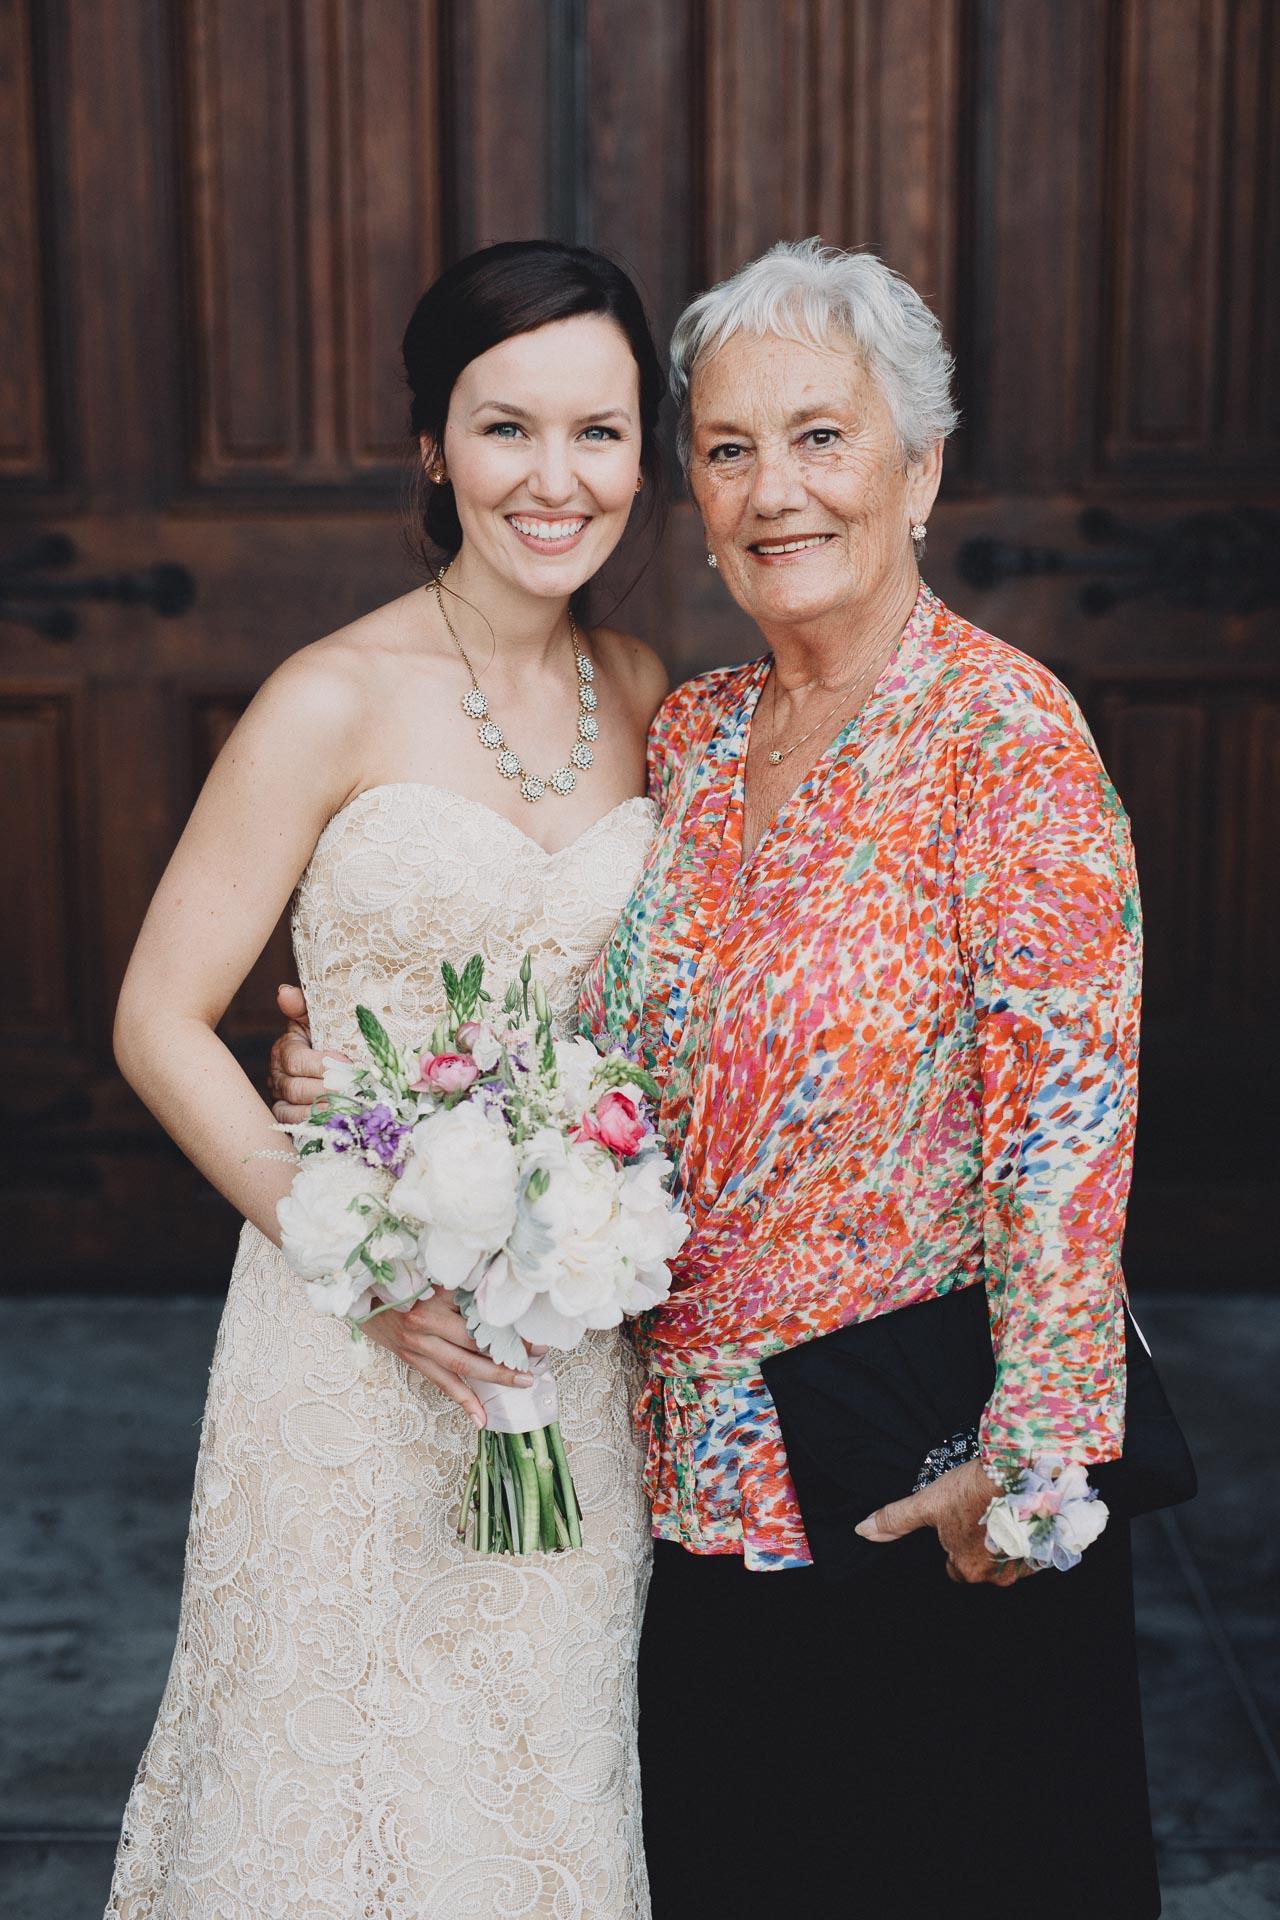 Julia-Michael-Cincinnati-Music-Hall-Wedding-090@2x.jpg